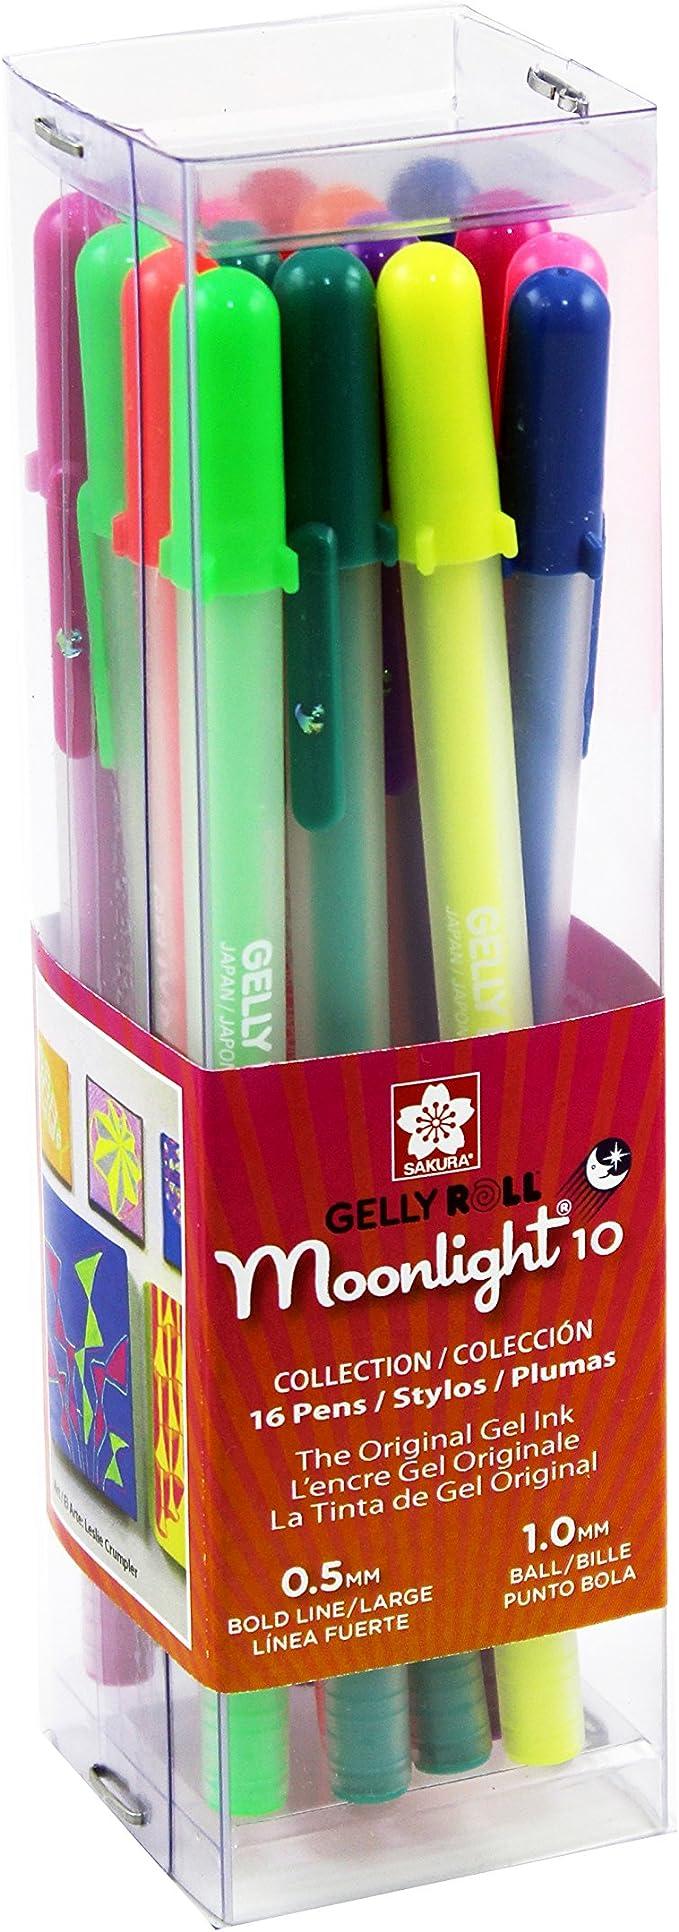 Sakura 58178 Gelly Roll Moonlight Bold Cube 16 Gel Pen Set Assorted Colors NEW!